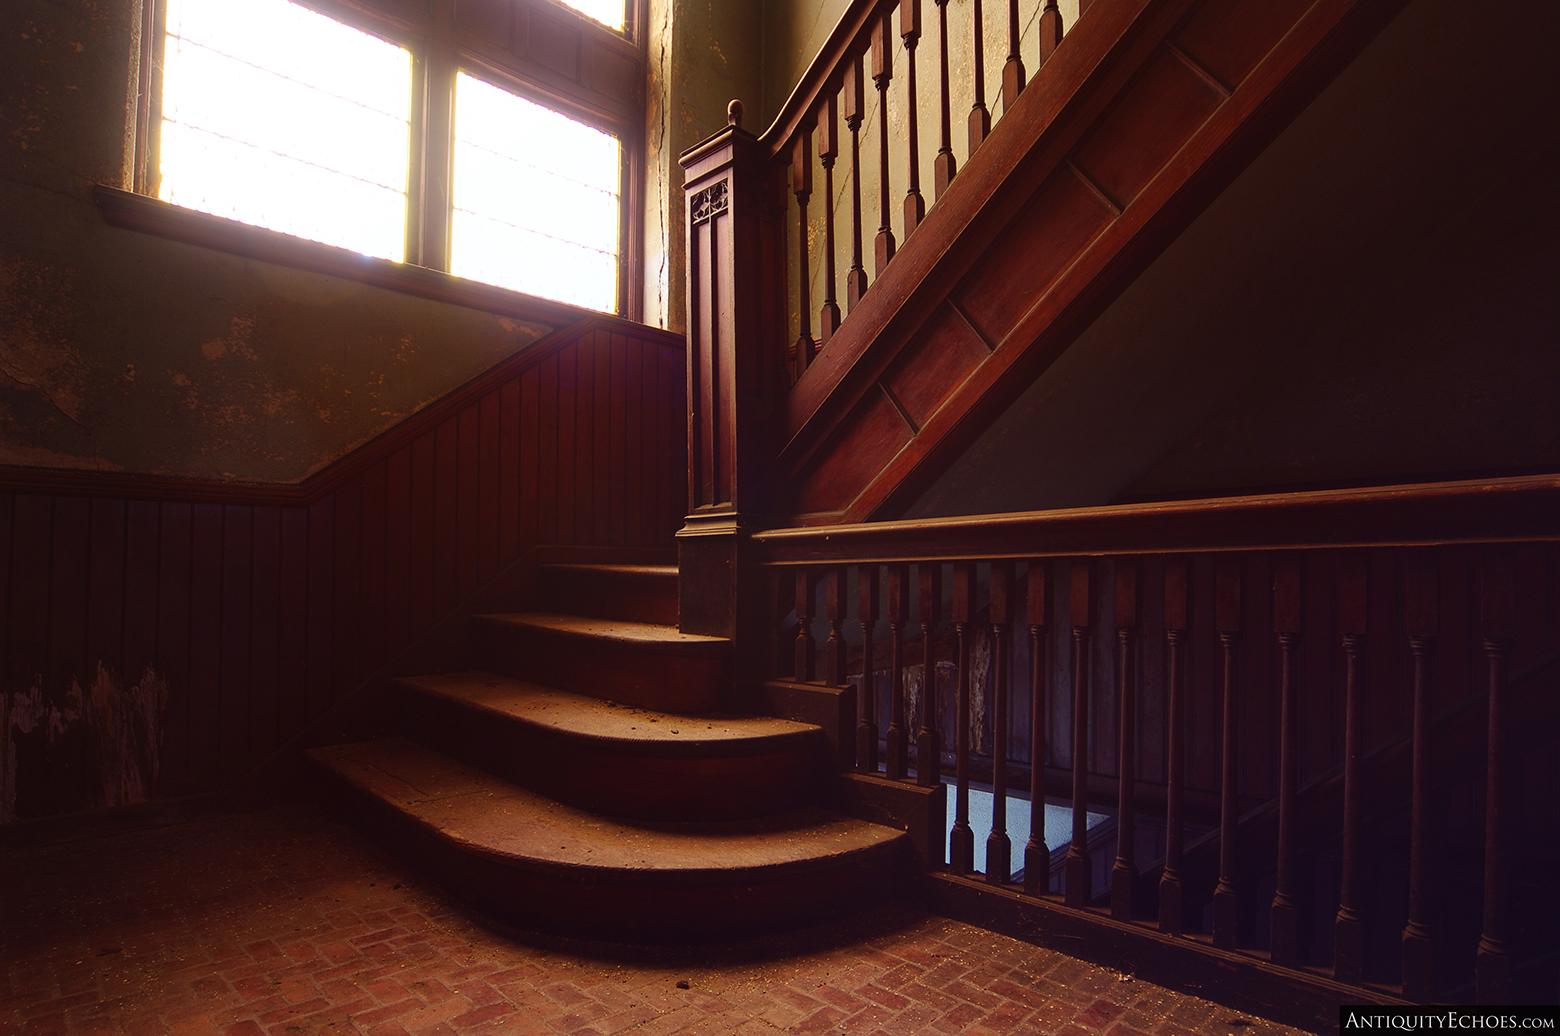 Third Presbyterian - Beautiful Wooden Staircase